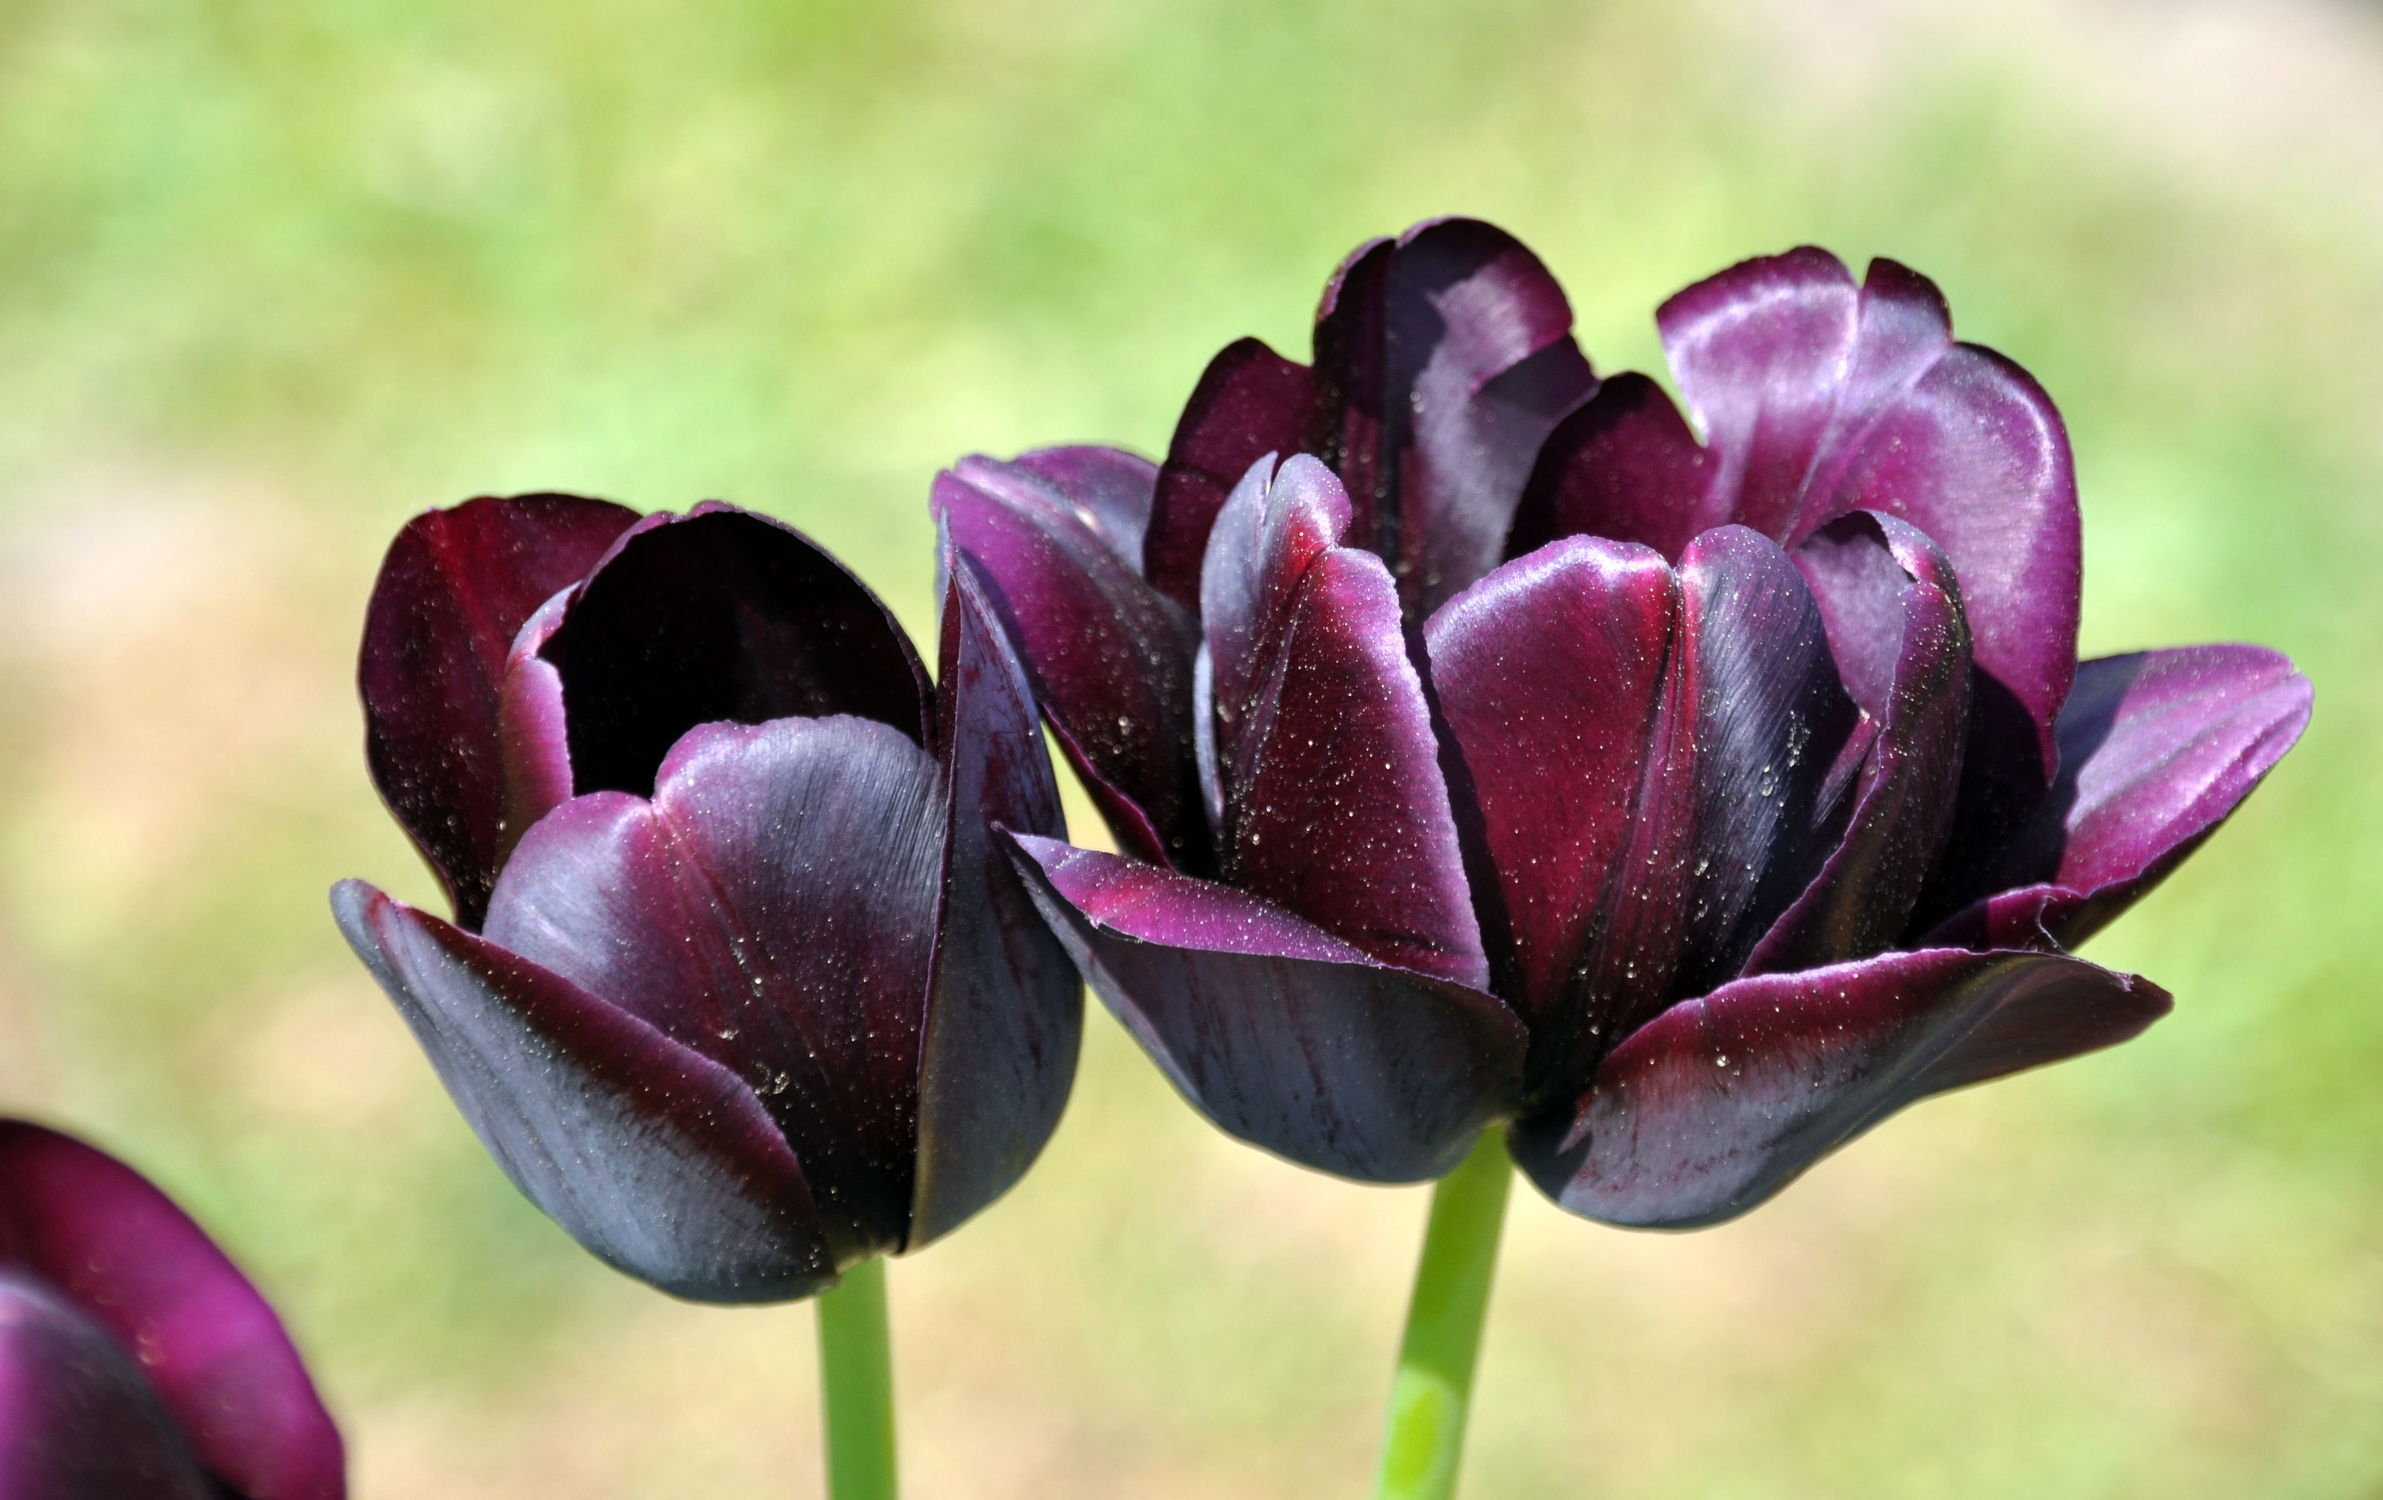 Bild mit Frühling, Tulpe, Tulips, Tulpen, Tulip, Blüten, intensiv, farbenfroh, leuchtend, tulpenpracht, tulpenbeet, frühblüher, frühjahr, zwei, duo, anders, besonders, dunkel